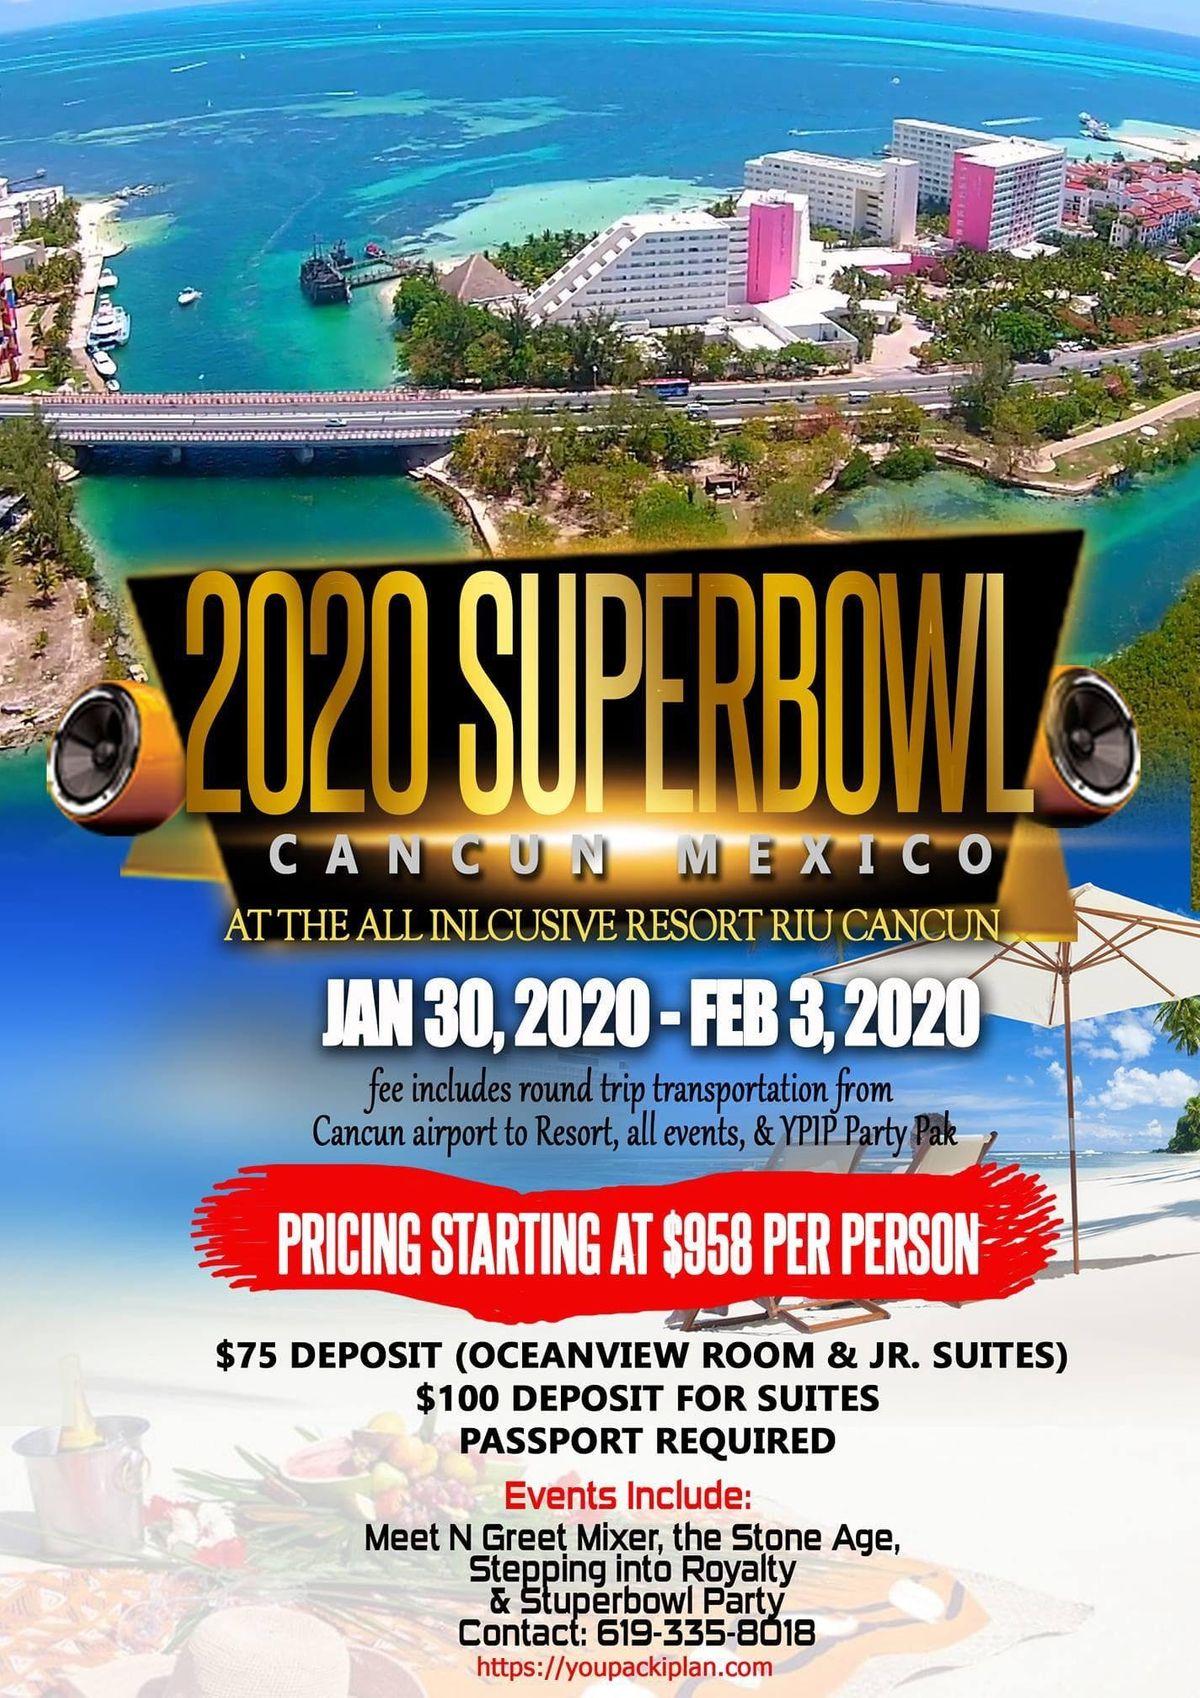 Super Bowl 2020 Events.Super Bowl 2020 Cancun